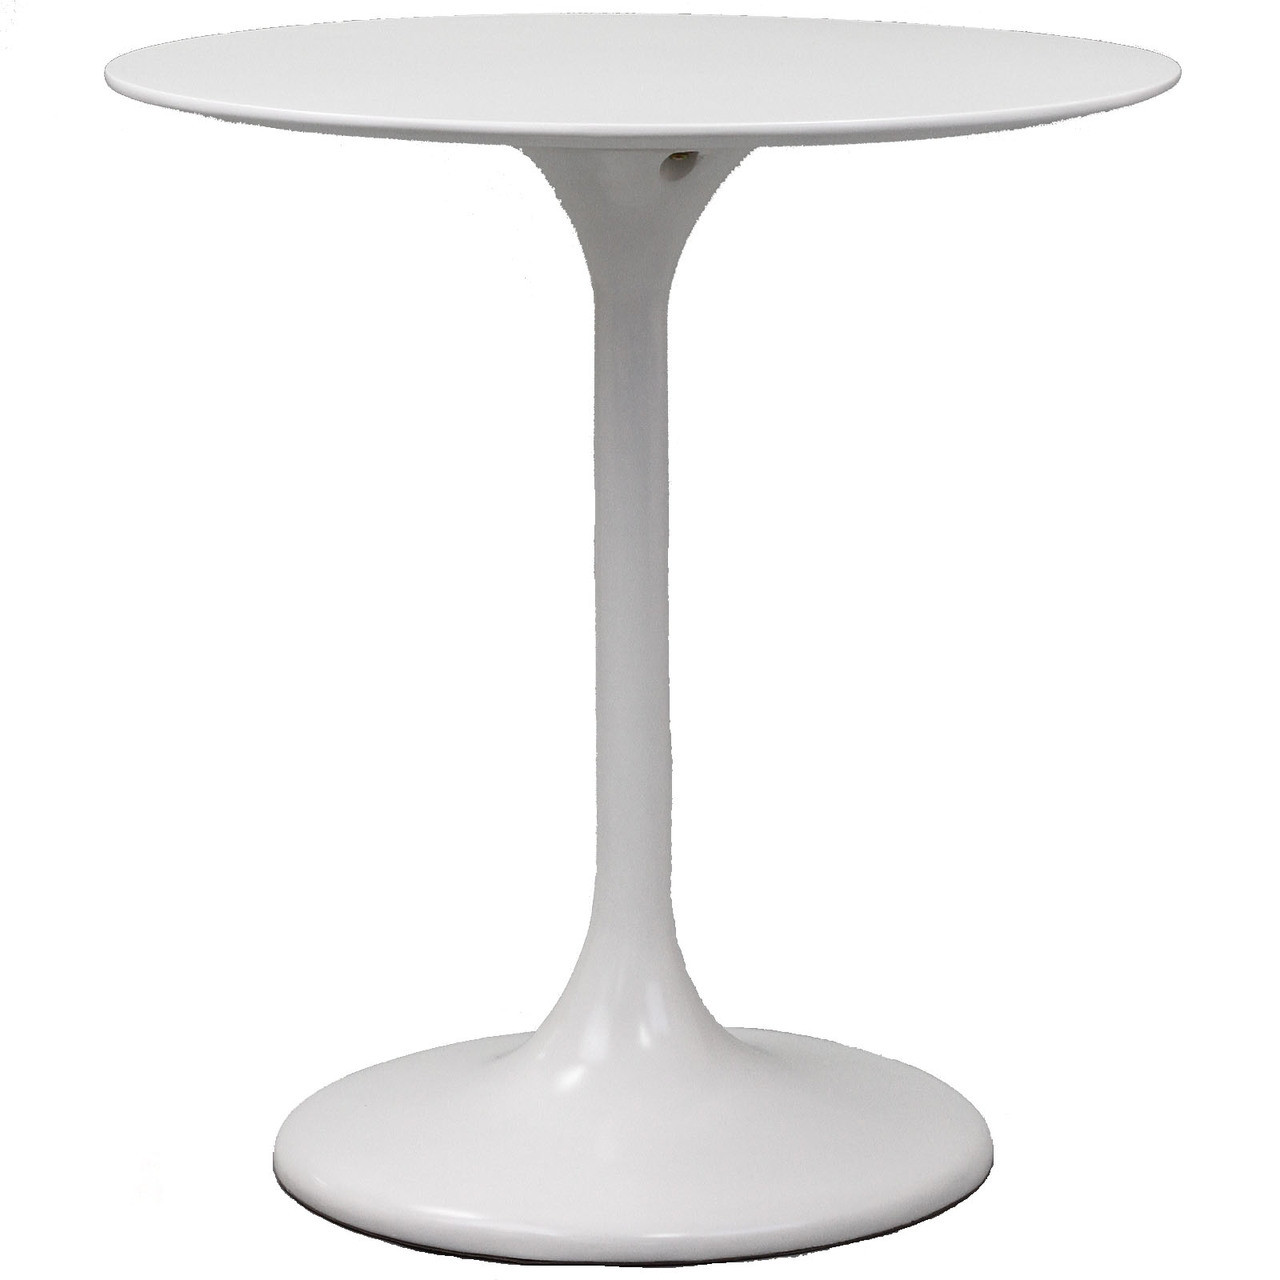 "Lippa 28"" Round Fiberglass Dining Table"